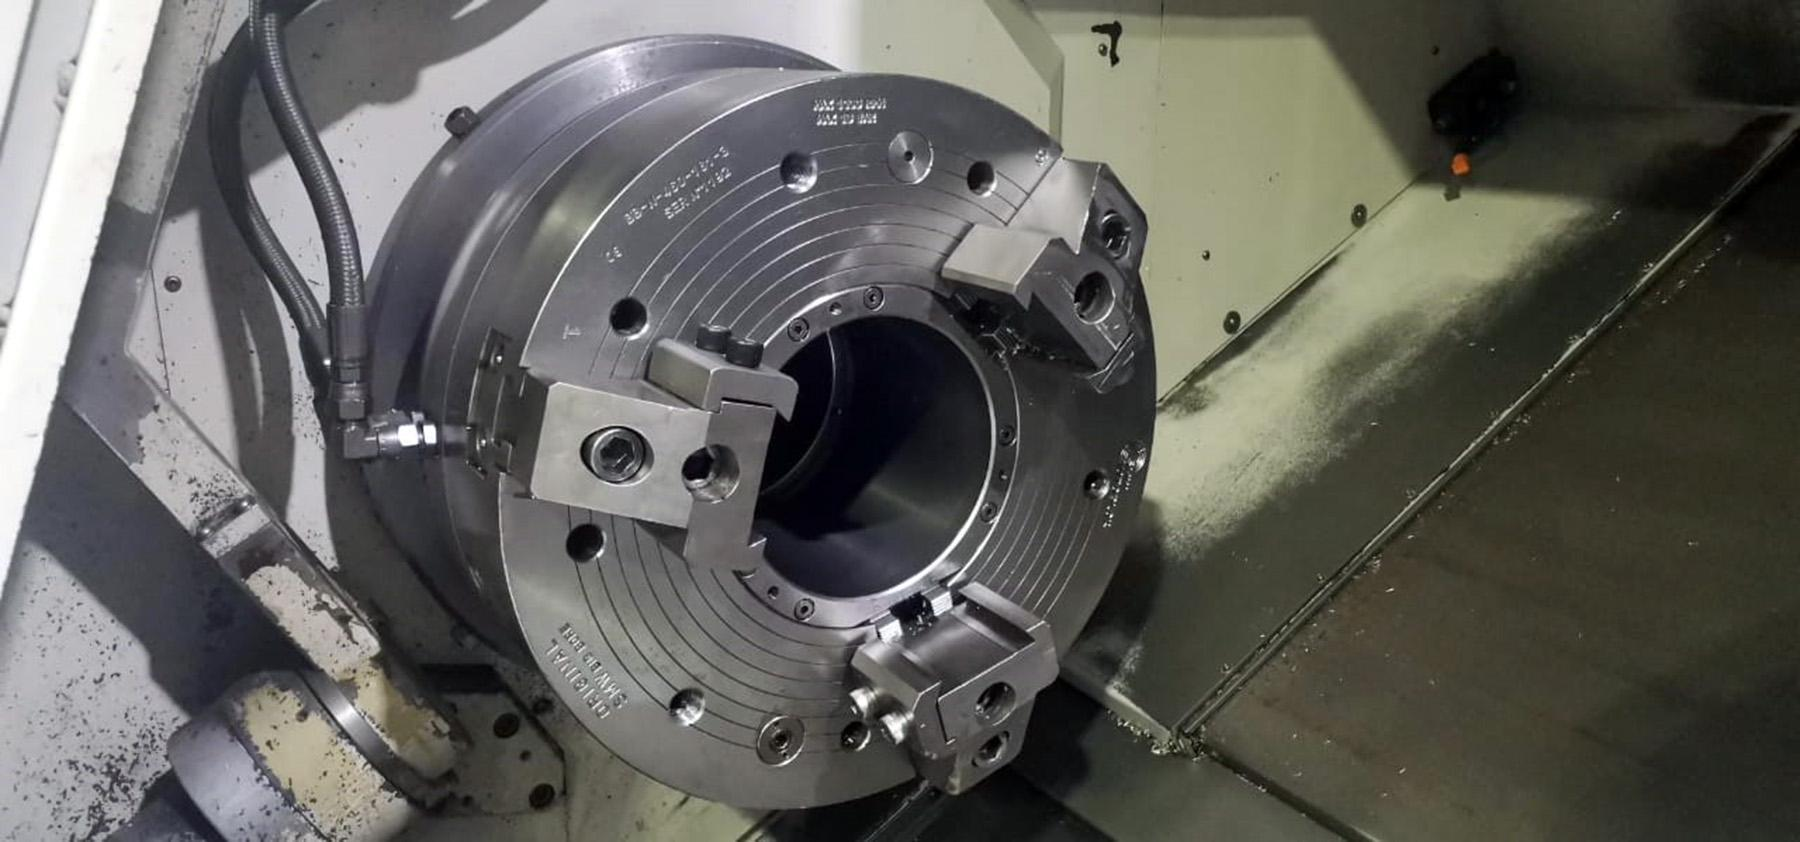 USED, MAZAK QUICK TURN NEXUS 450-II CNC TURNING CENTER